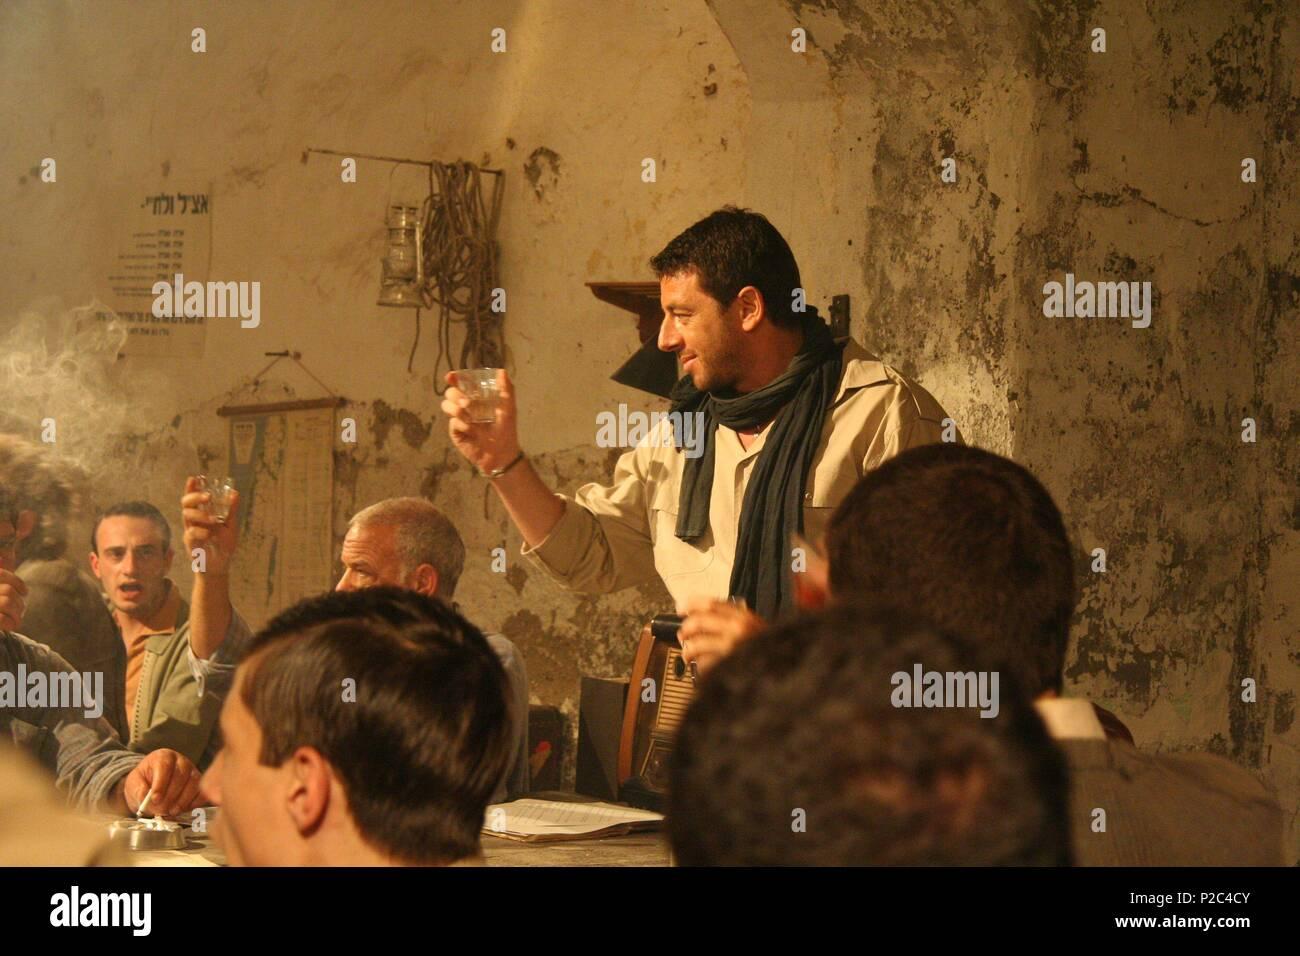 Original Film Title: O JERUSALEM  English Title: O JERUSALEM  Film